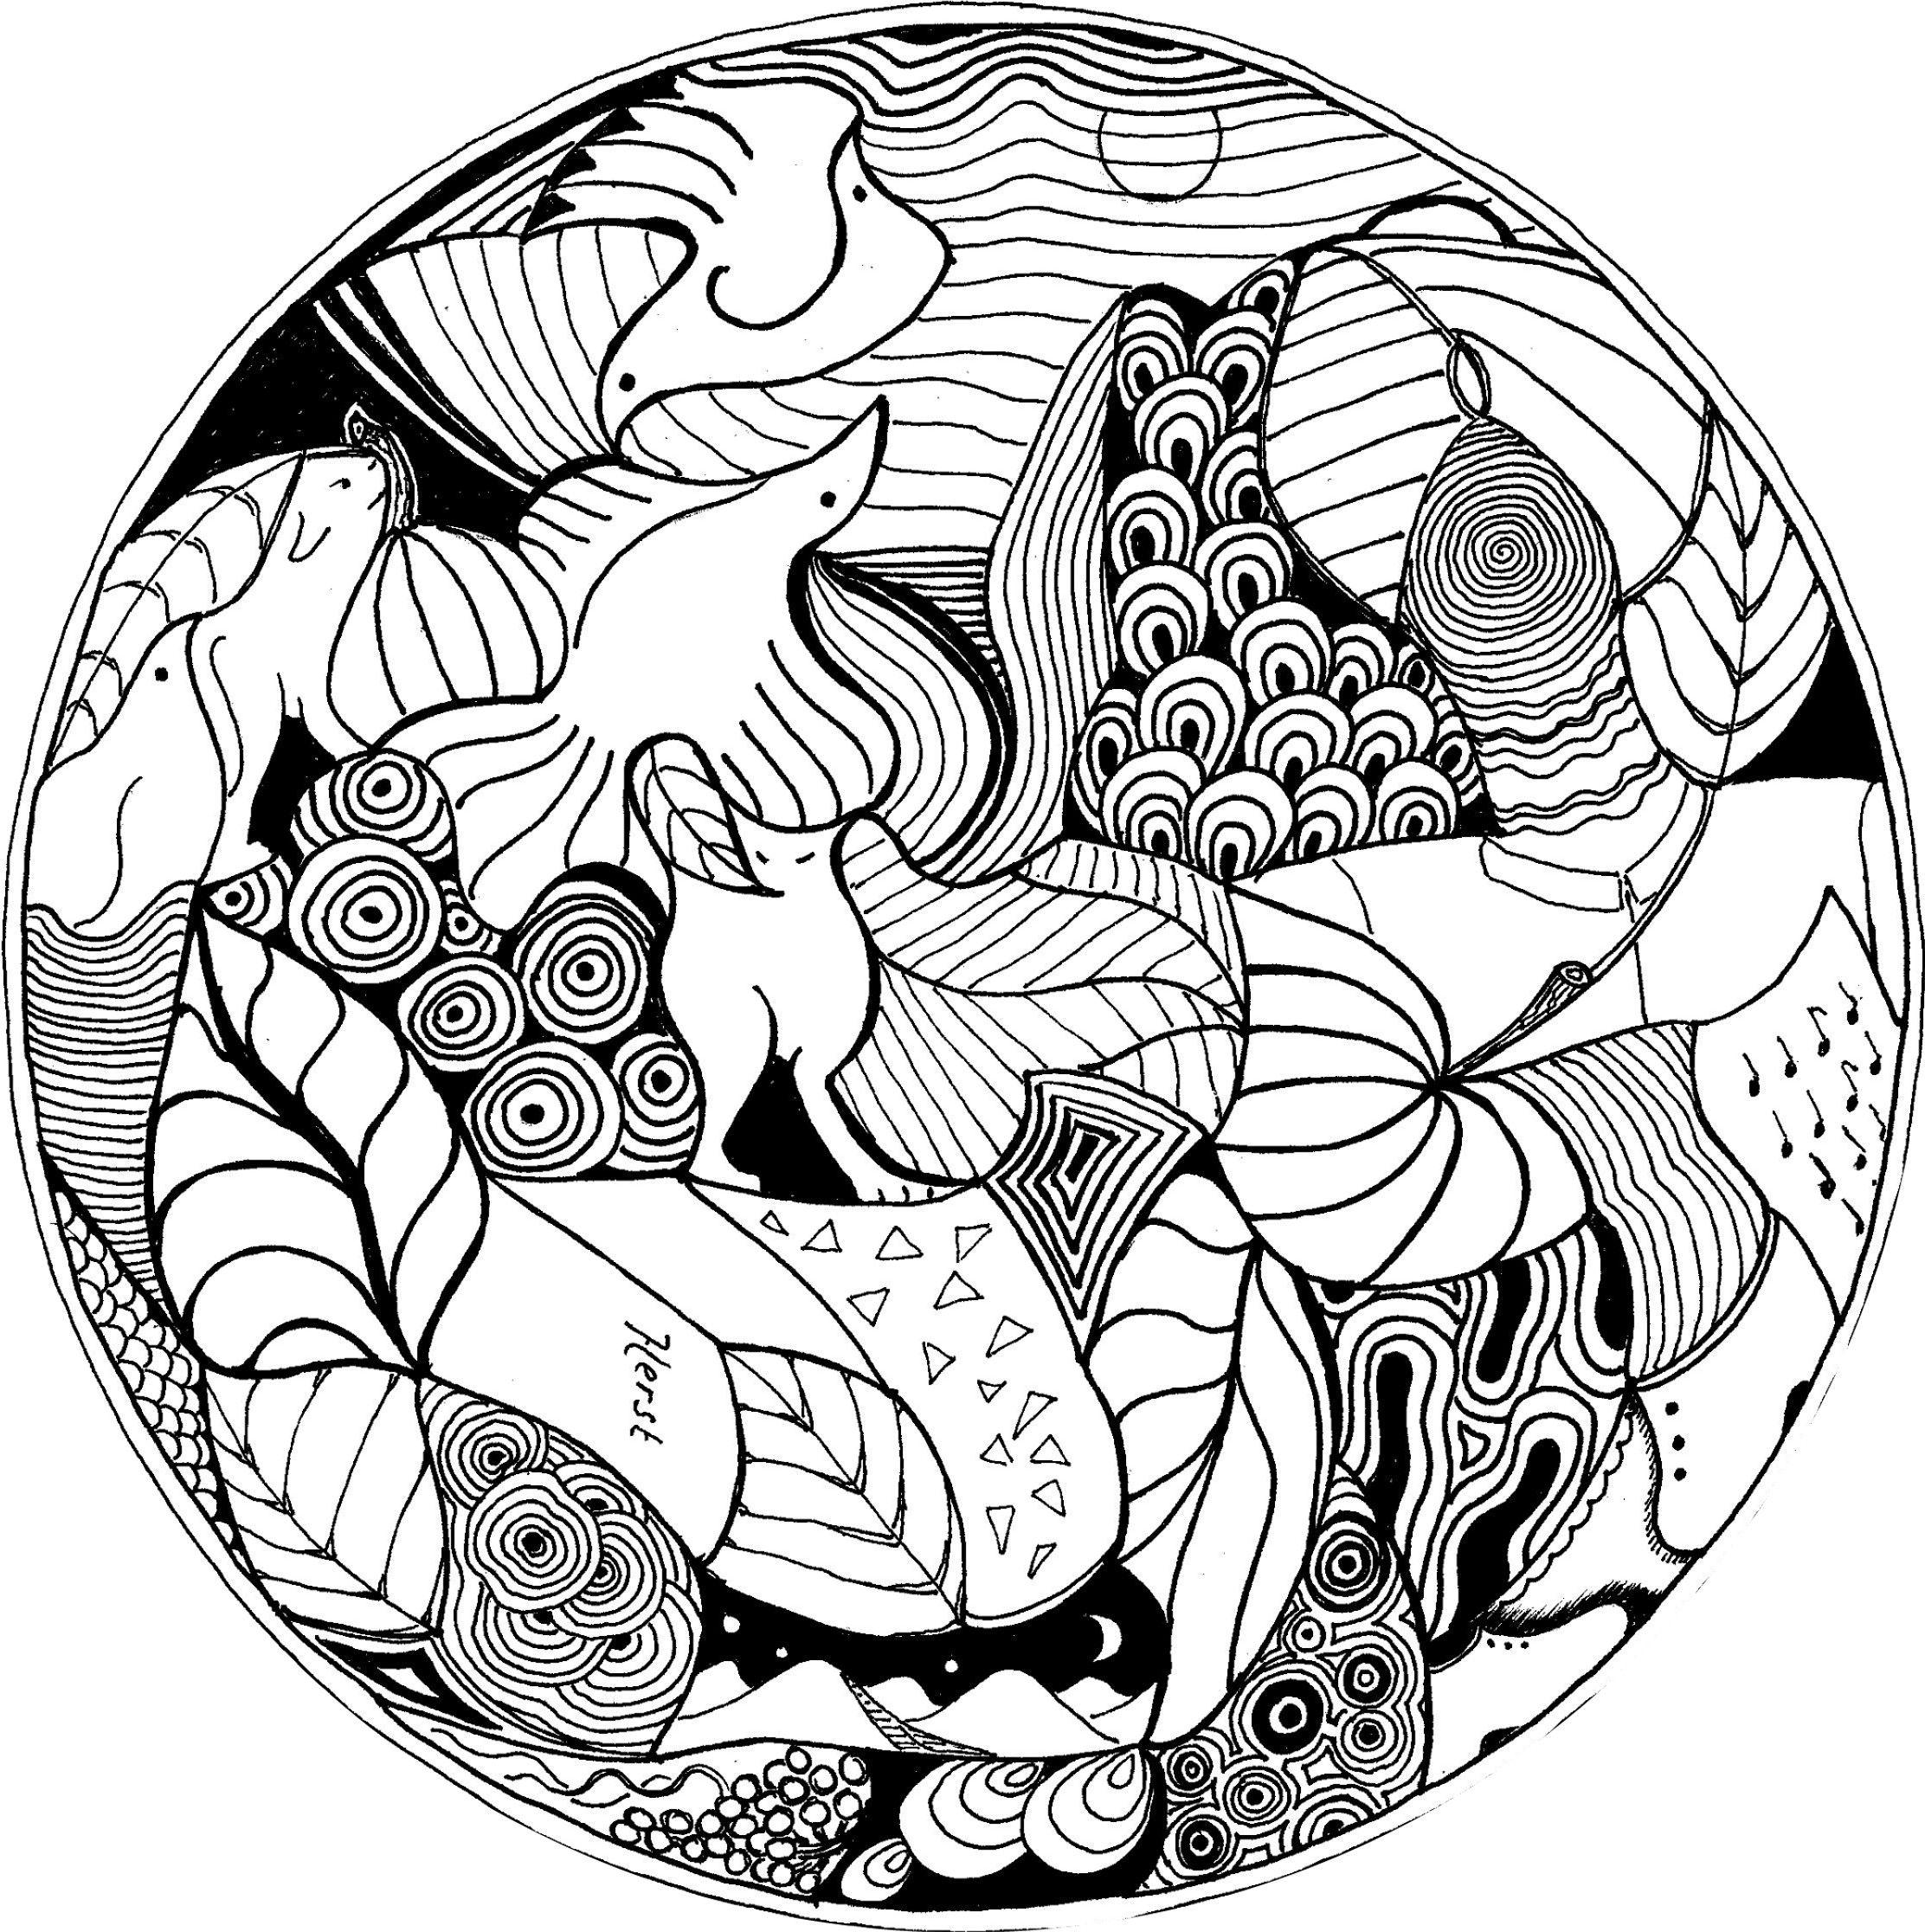 Mandala Zwart Wit 06 Mandala Kleurplaten Zwart Wit Mandala